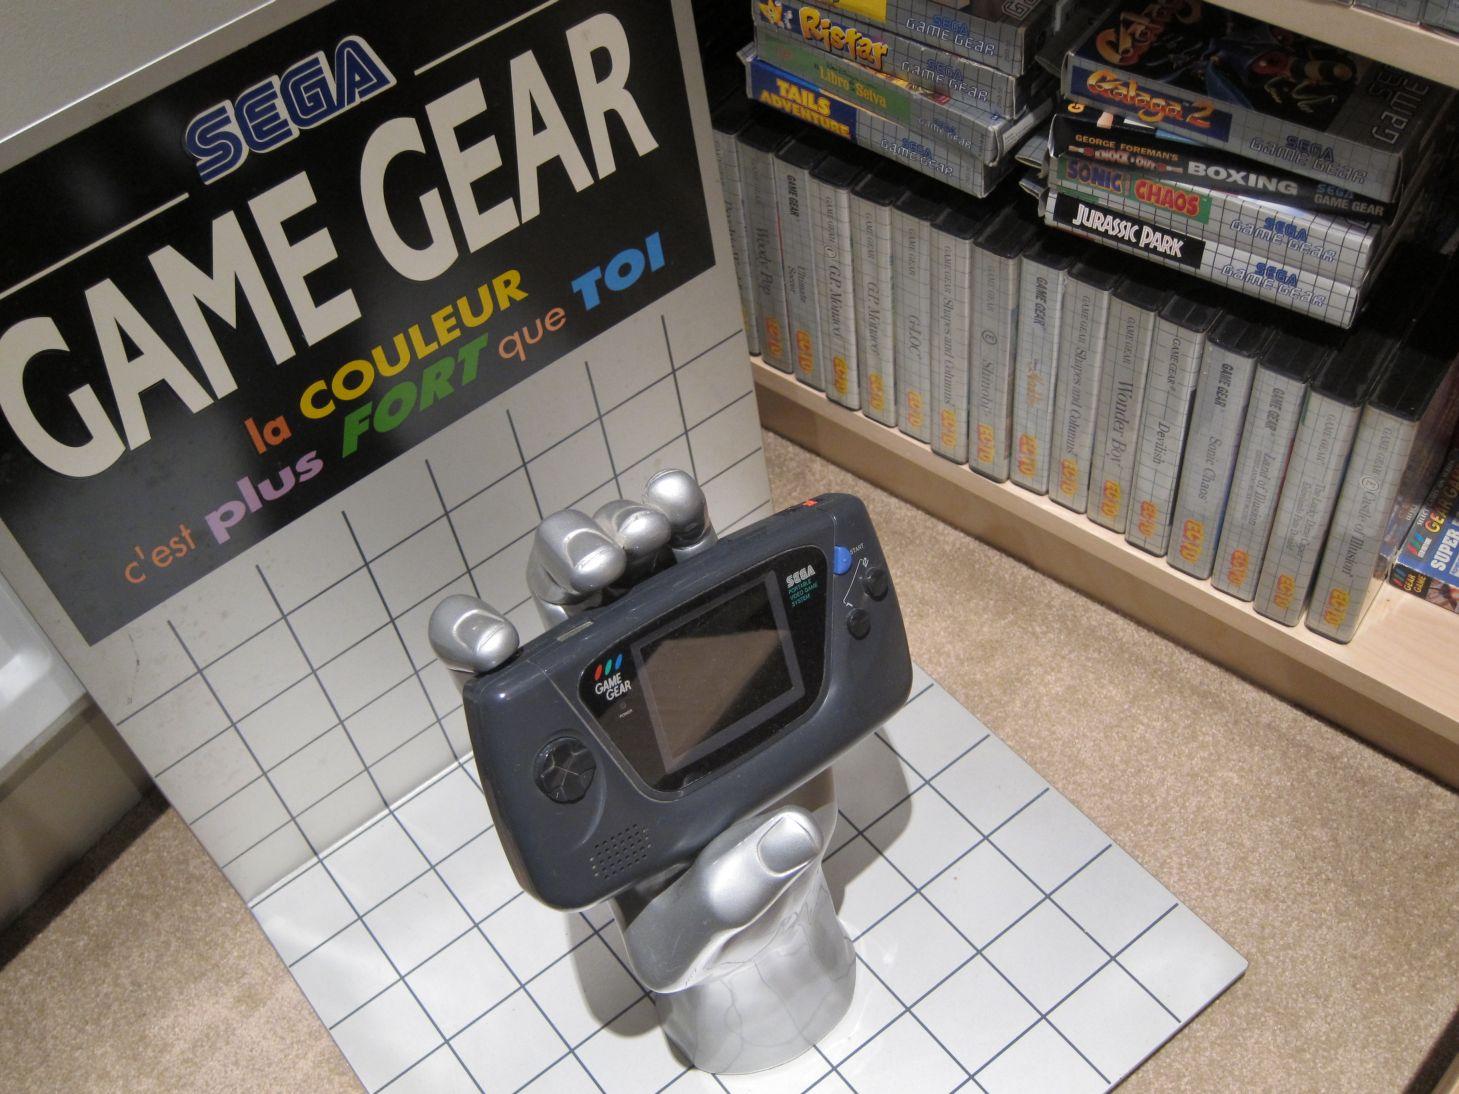 Ma collection Sega 8-bit Gamegearpromohand_03_162